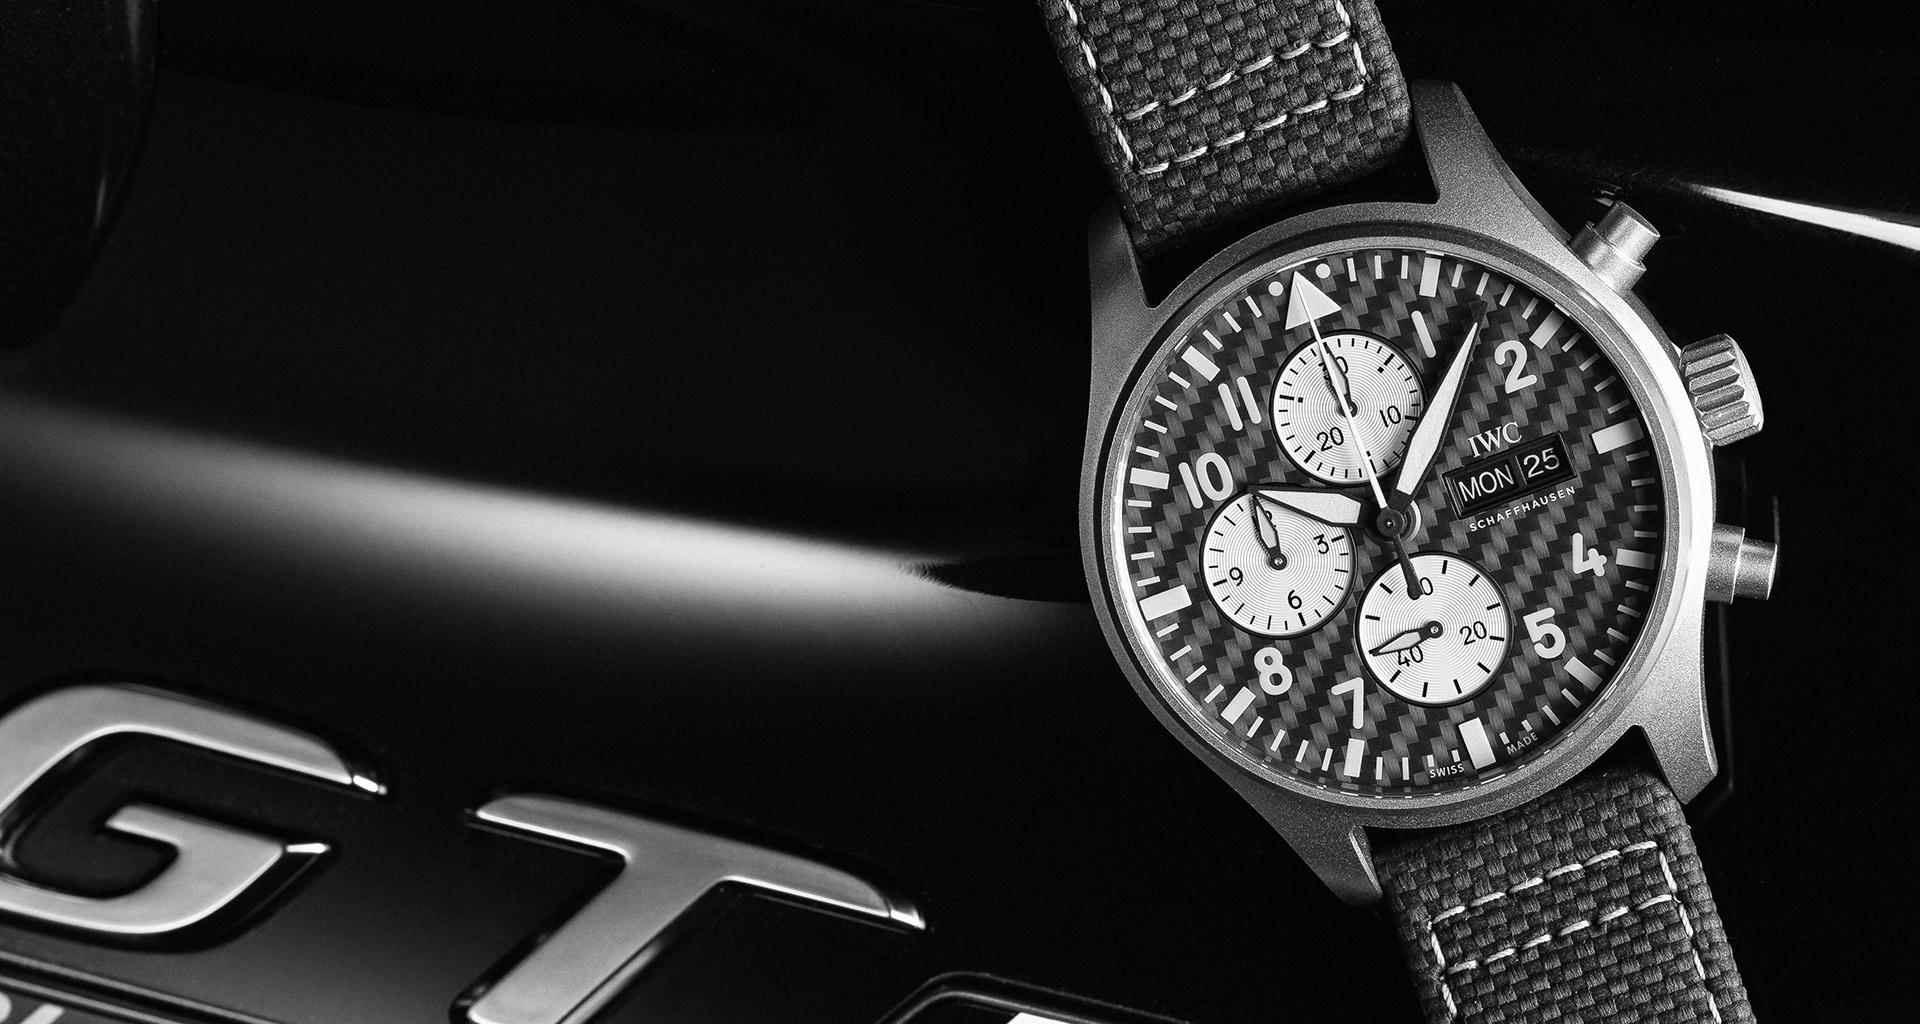 IWC Schaffhausen x Mercedes-AMG launch Pilot's Chronograph